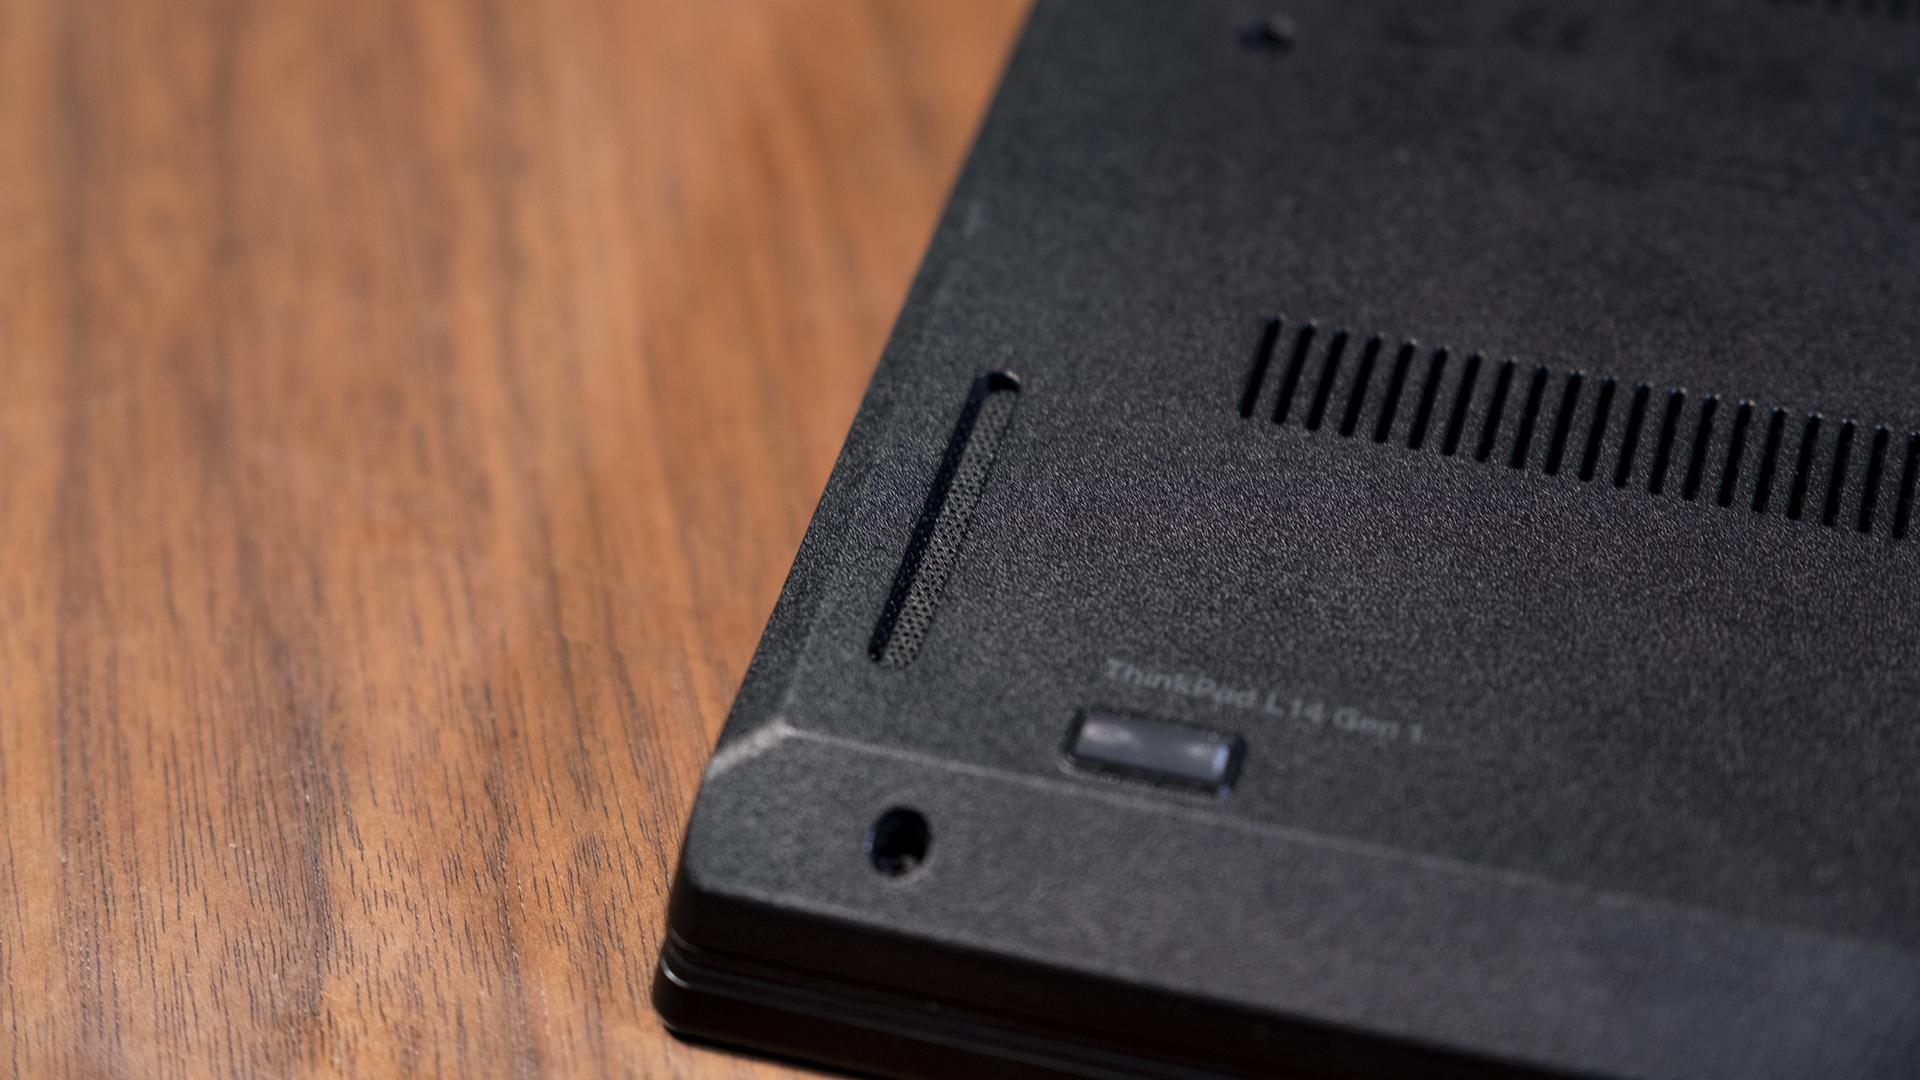 Lenovo ThinkPad L14 AMD Lautsprecher Unterseite